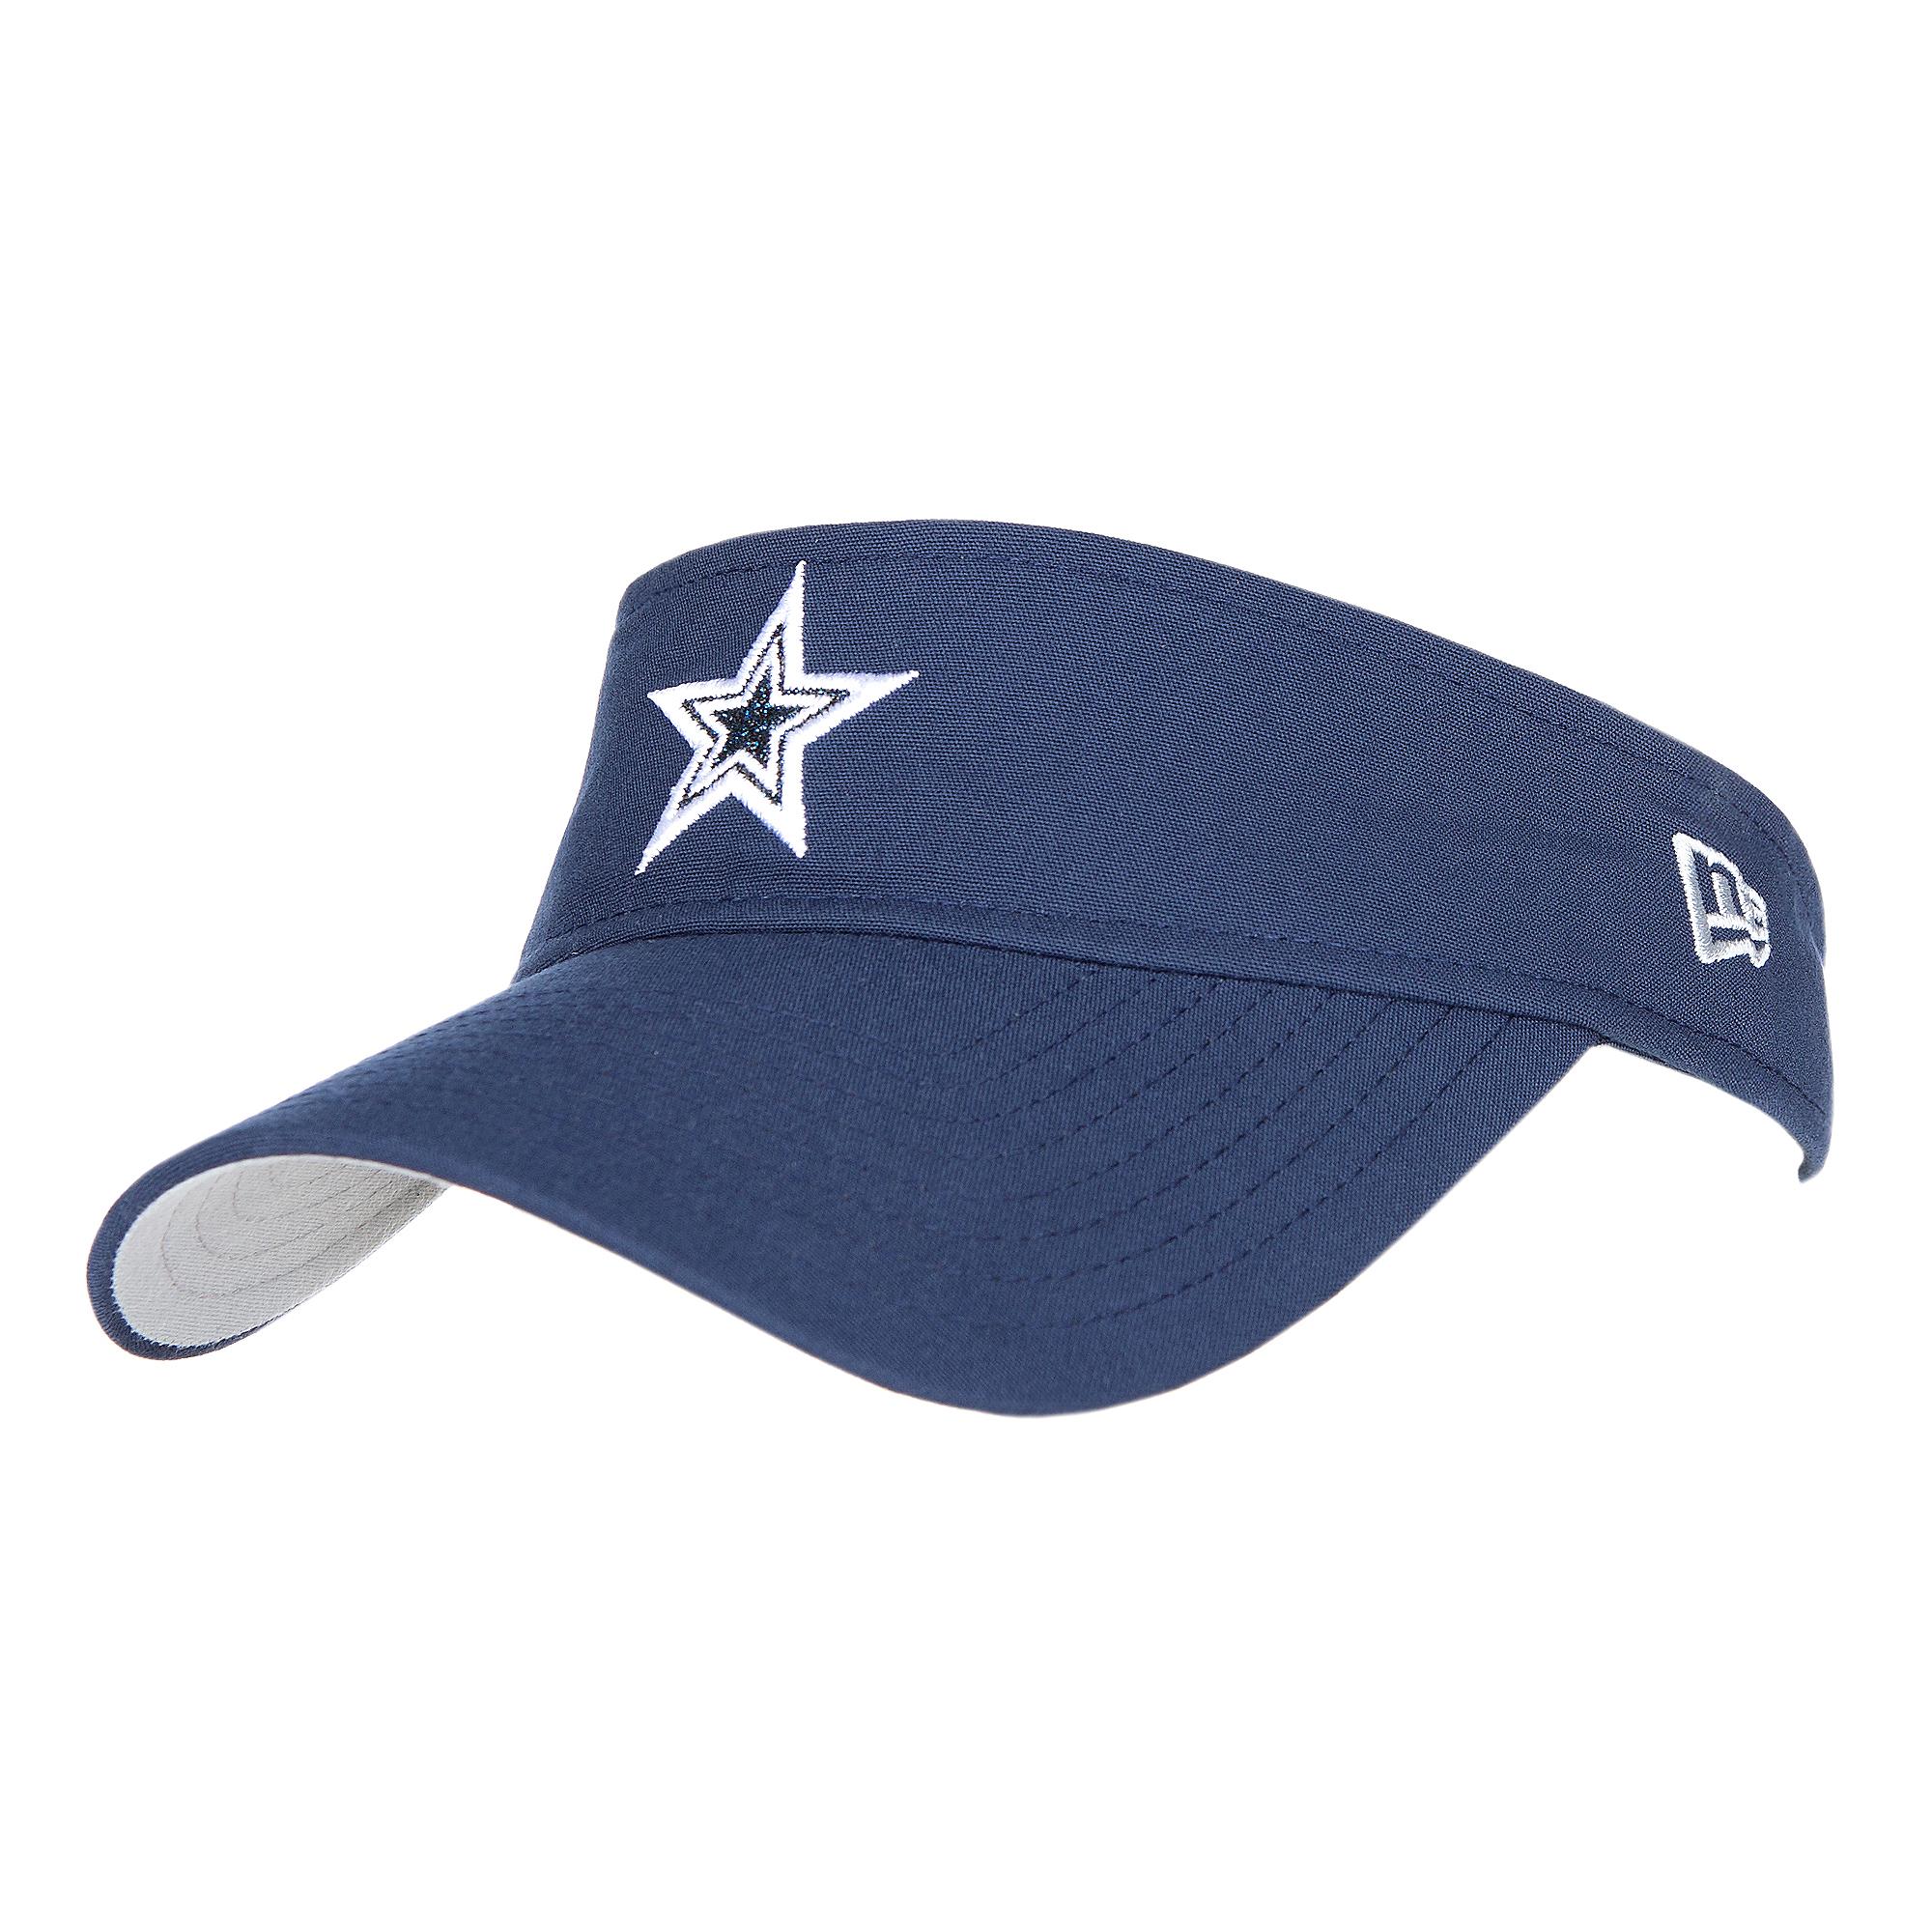 0eff3732 Dallas Cowboys New Era Womens Team Glisten Visor   Dallas Cowboys Pro Shop